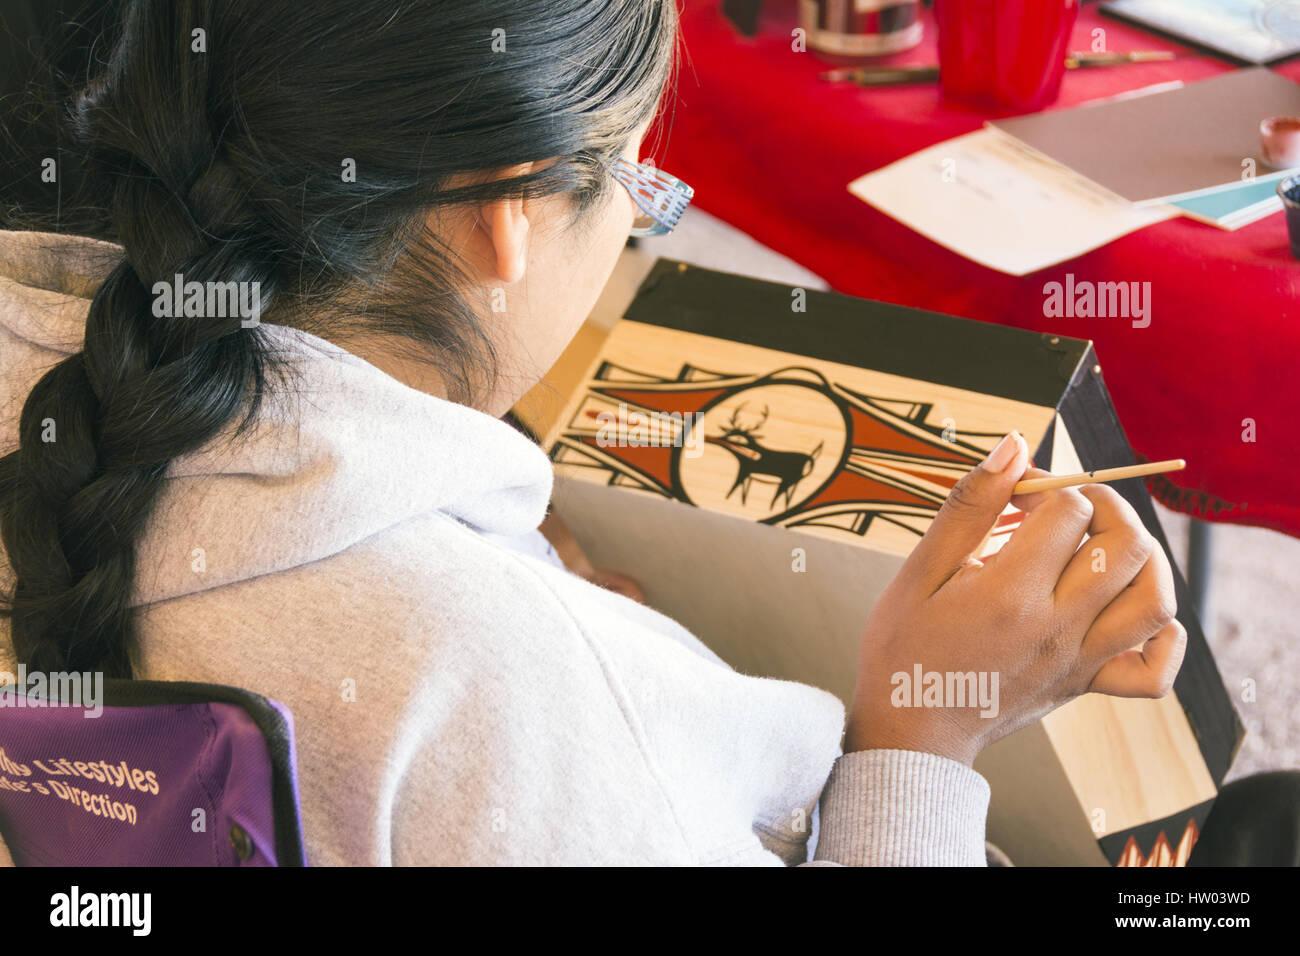 New Mexico, Pueblo of Zuni, Zuni Visitor and Arts Center,  Zuni artisans - Stock Image